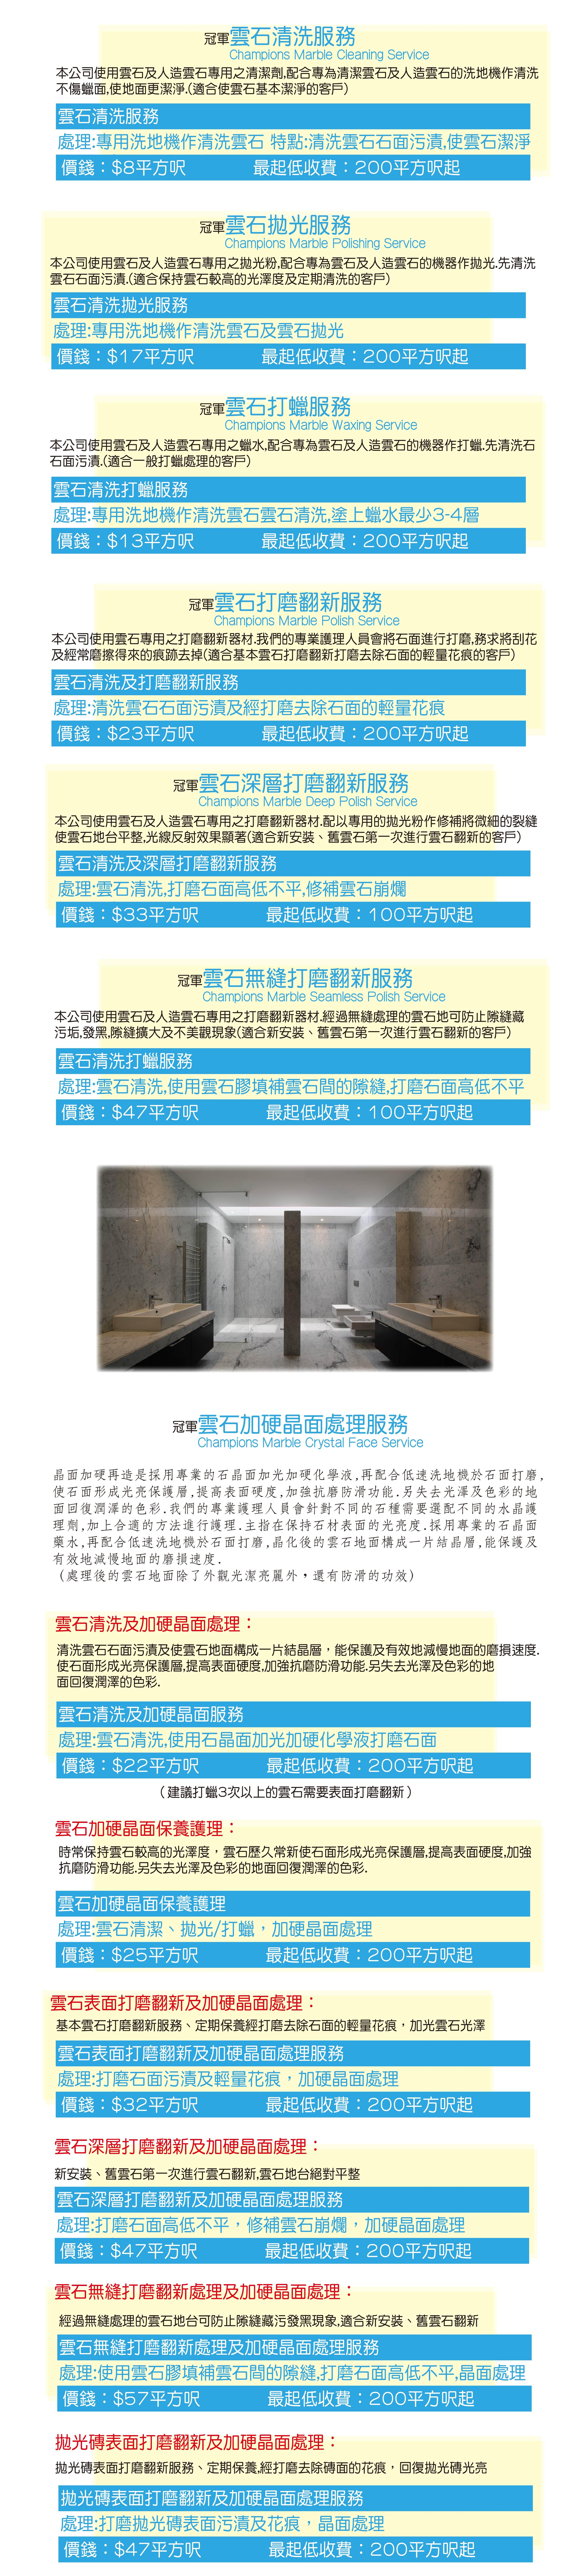 web clean b-01